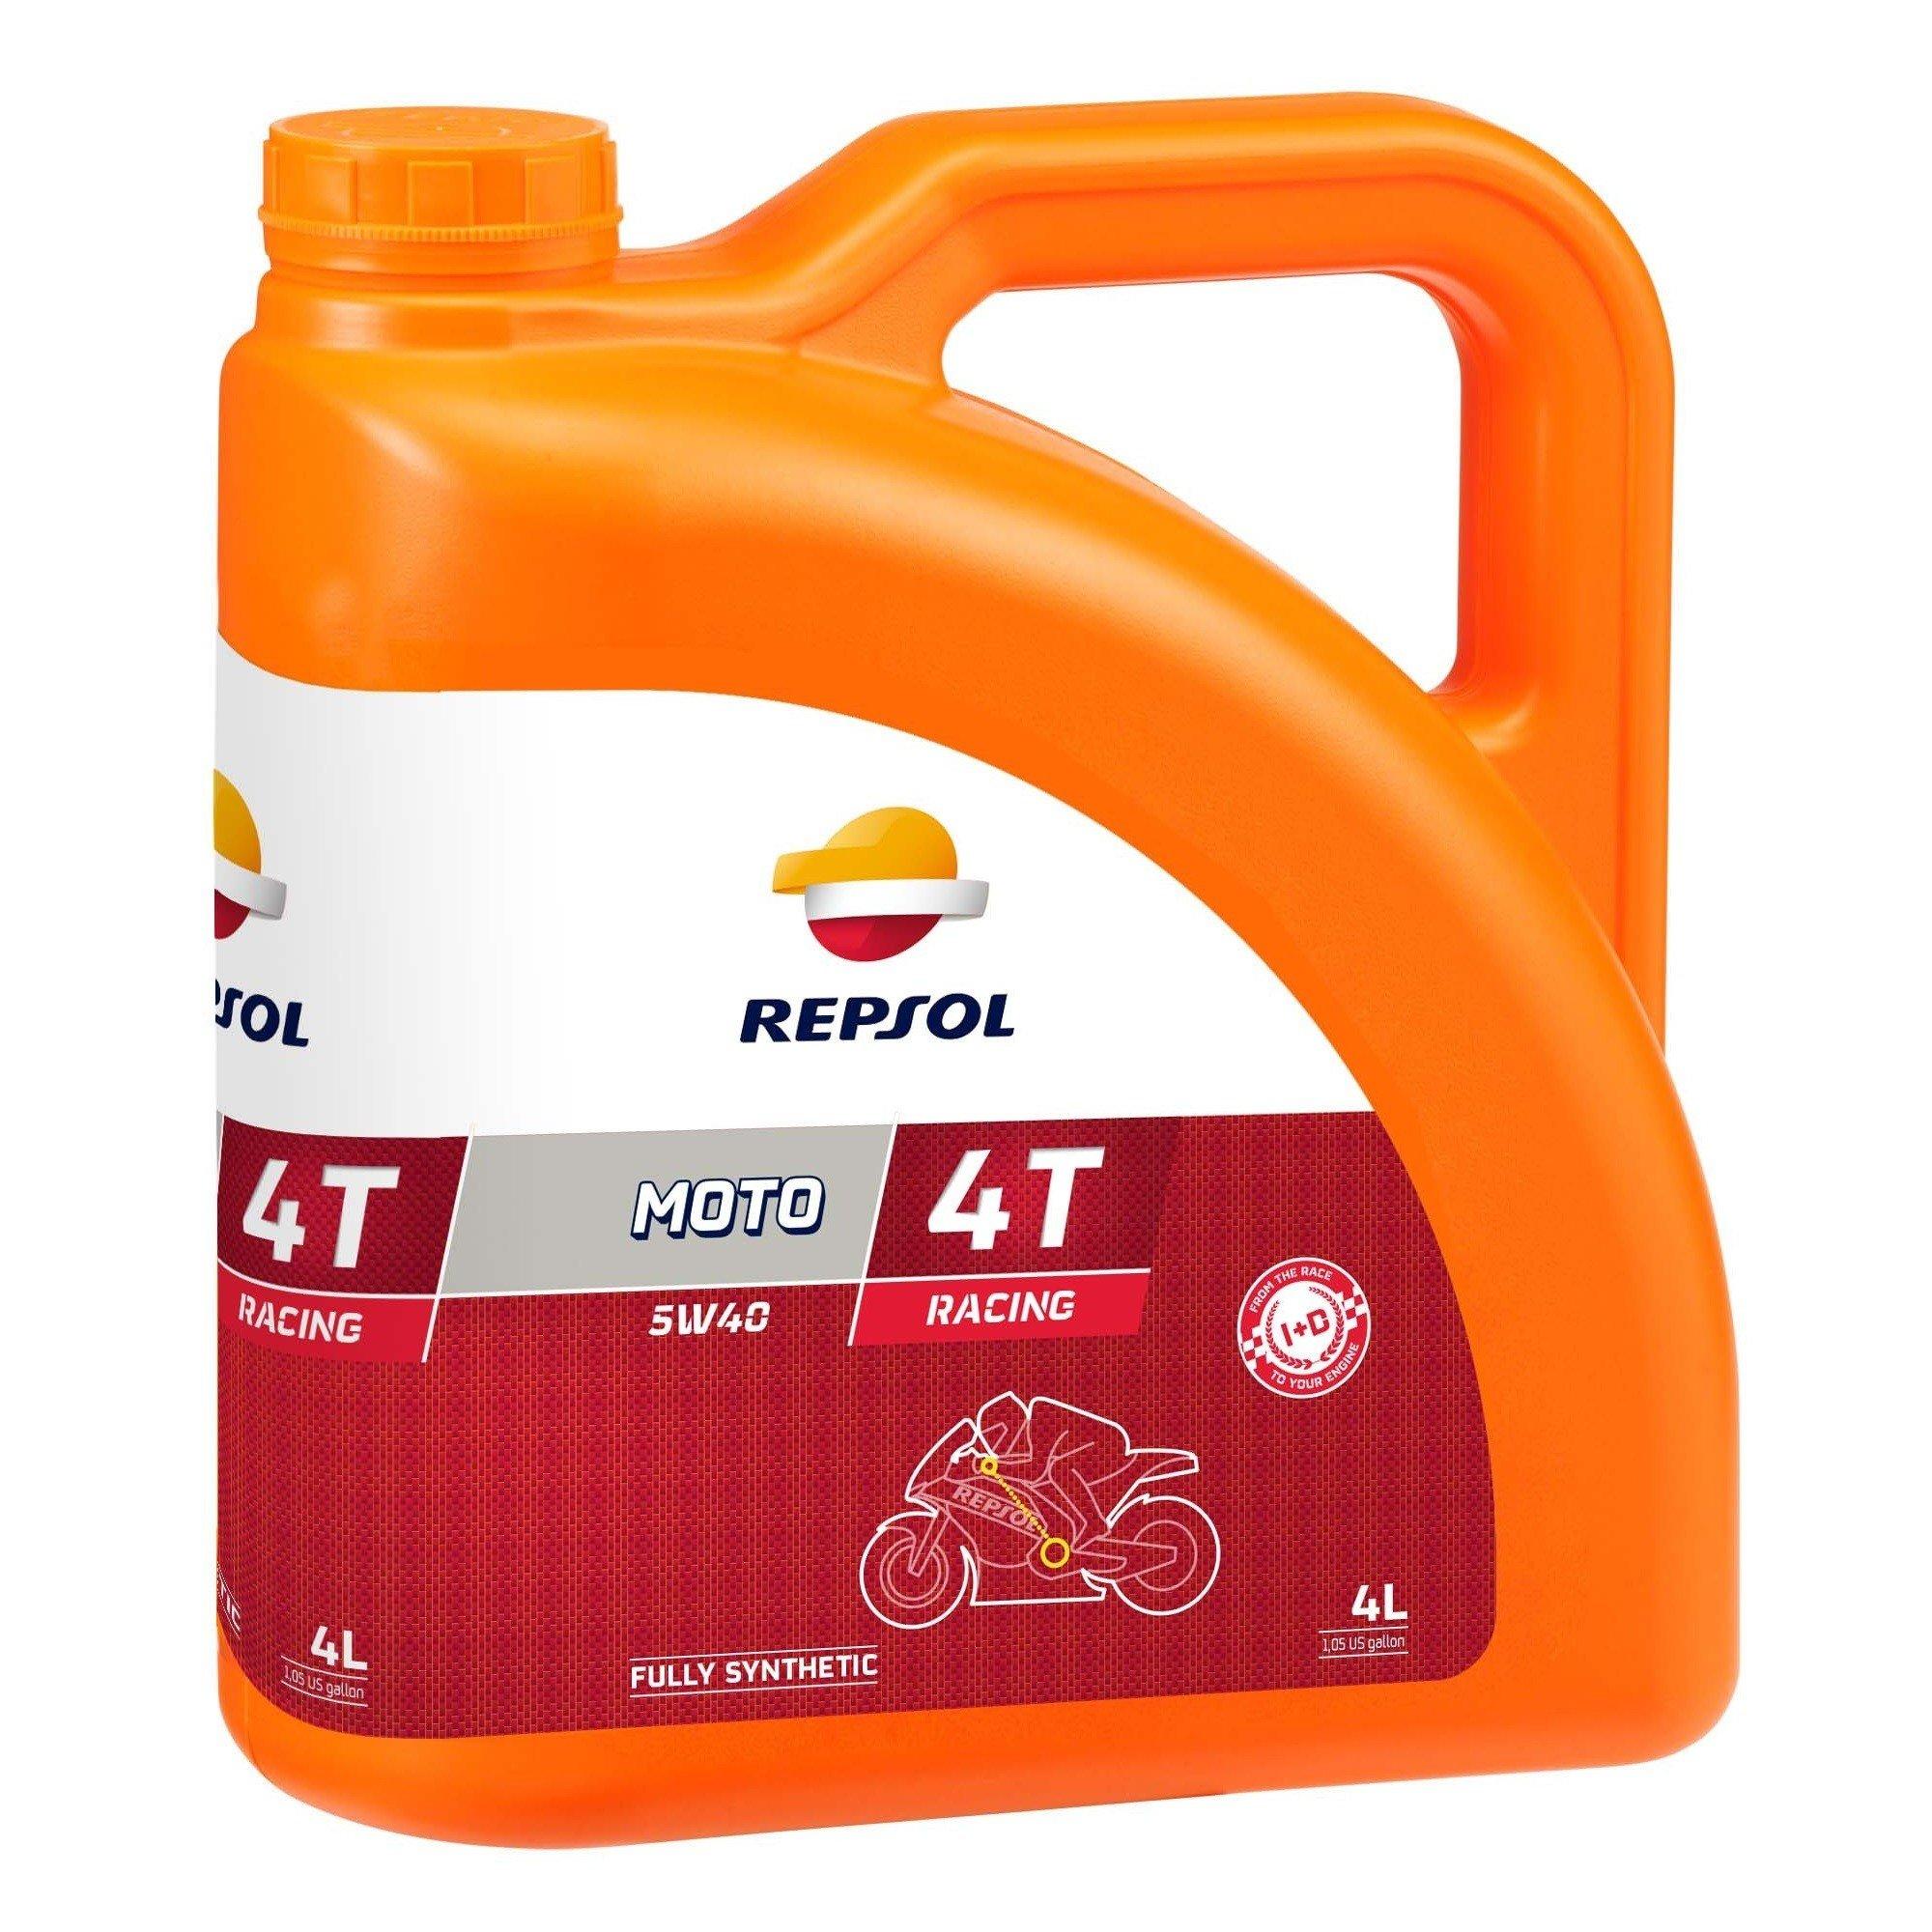 Repsol Moto Racing 4T 5W40, 4L